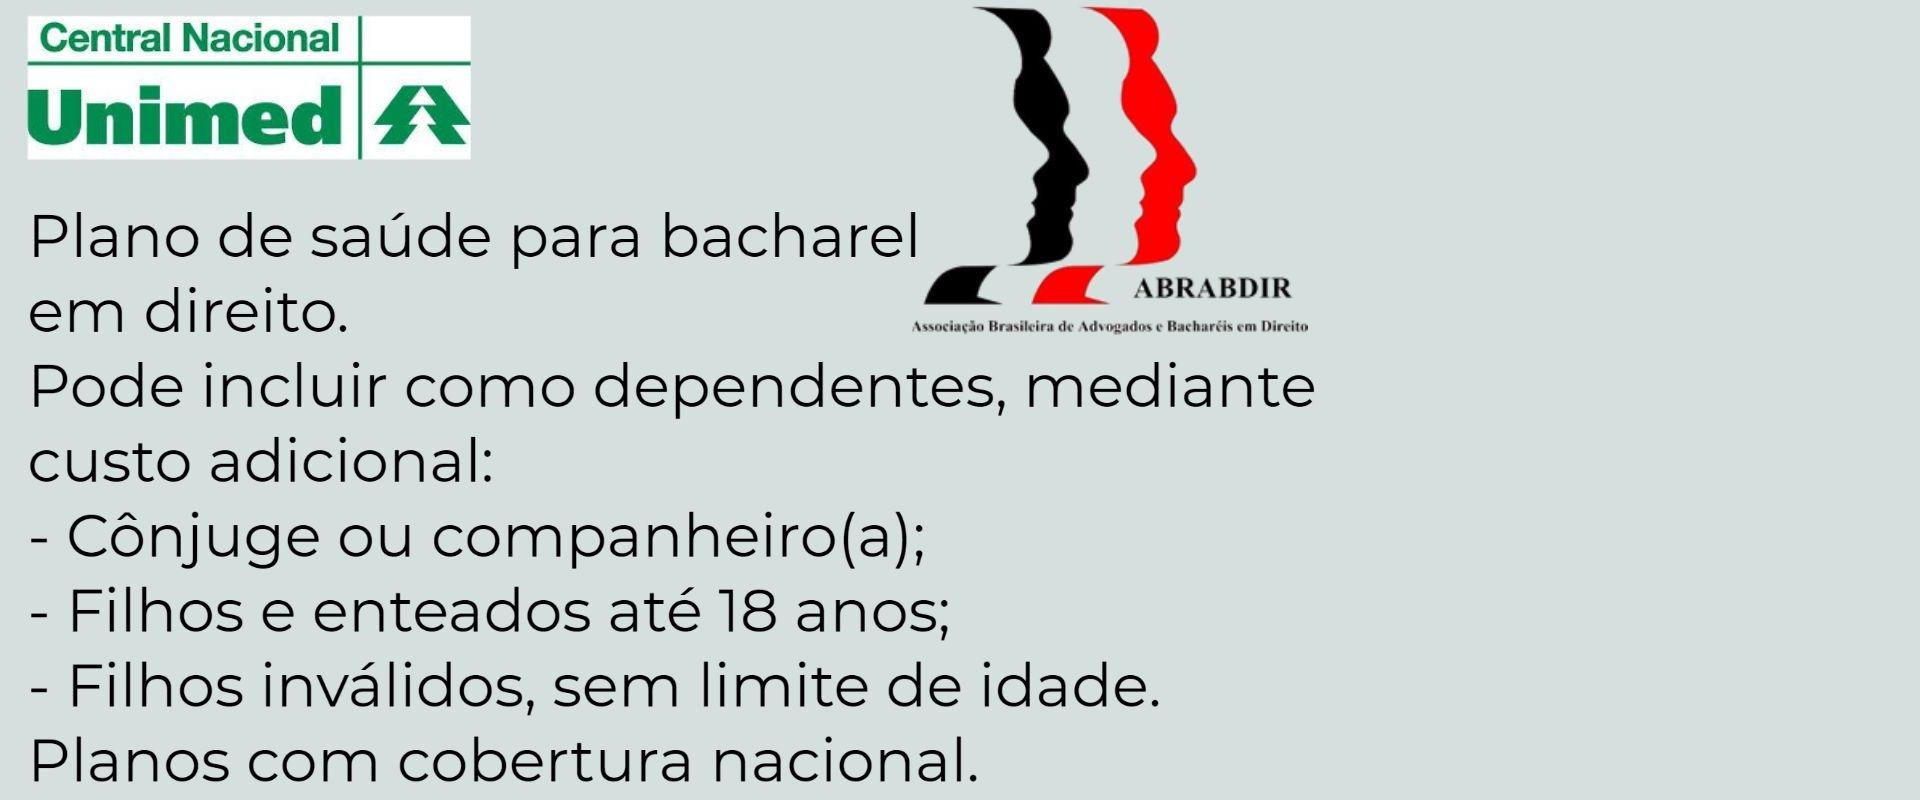 Unimed ABRABDIR Andradina